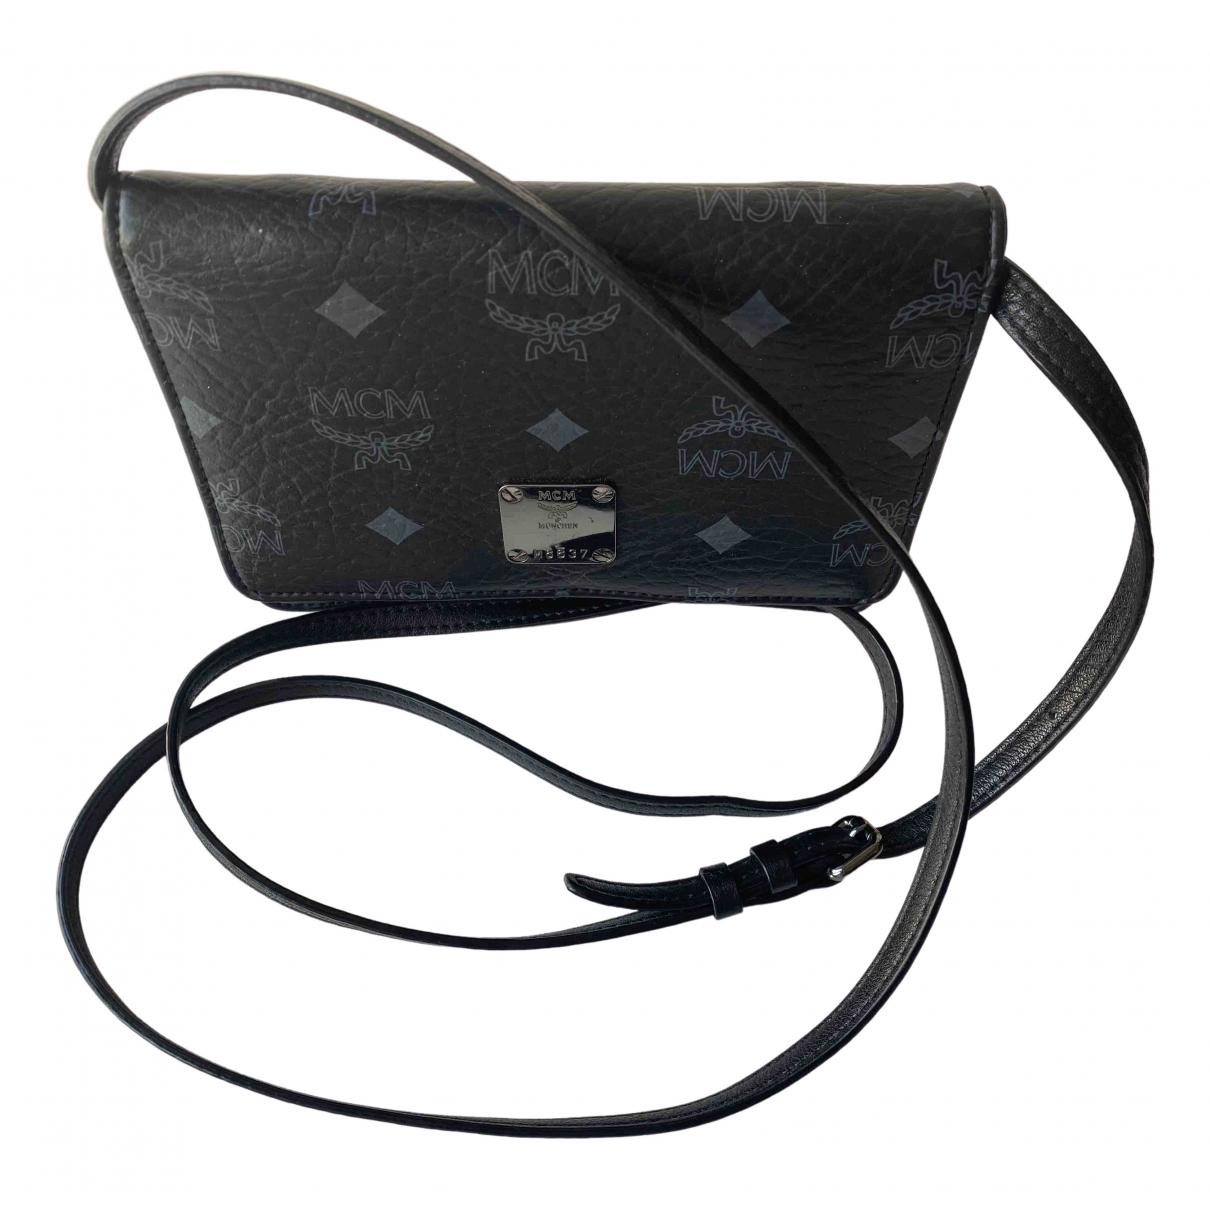 Mcm \N Black Patent leather handbag for Women \N